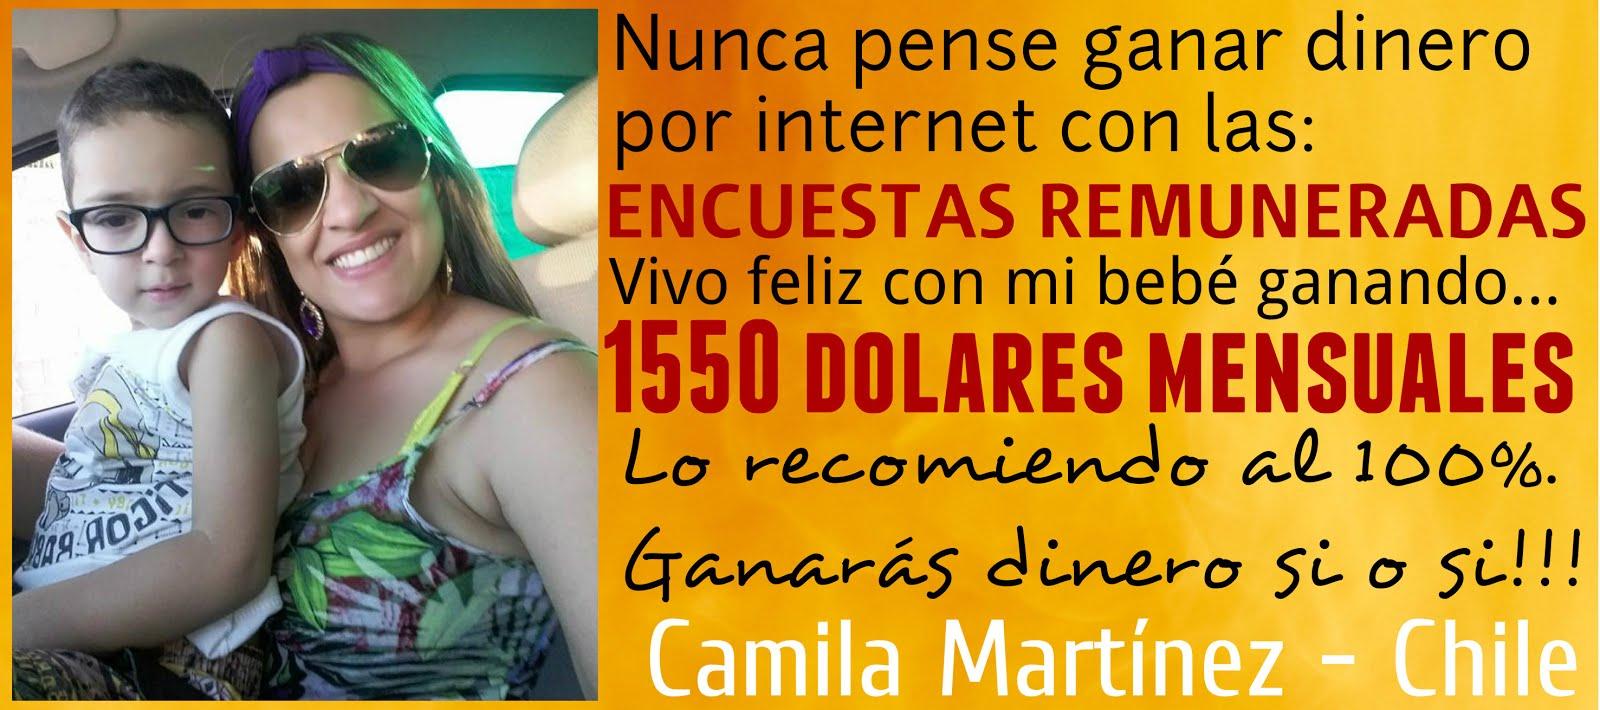 Camila Martínez - Chile